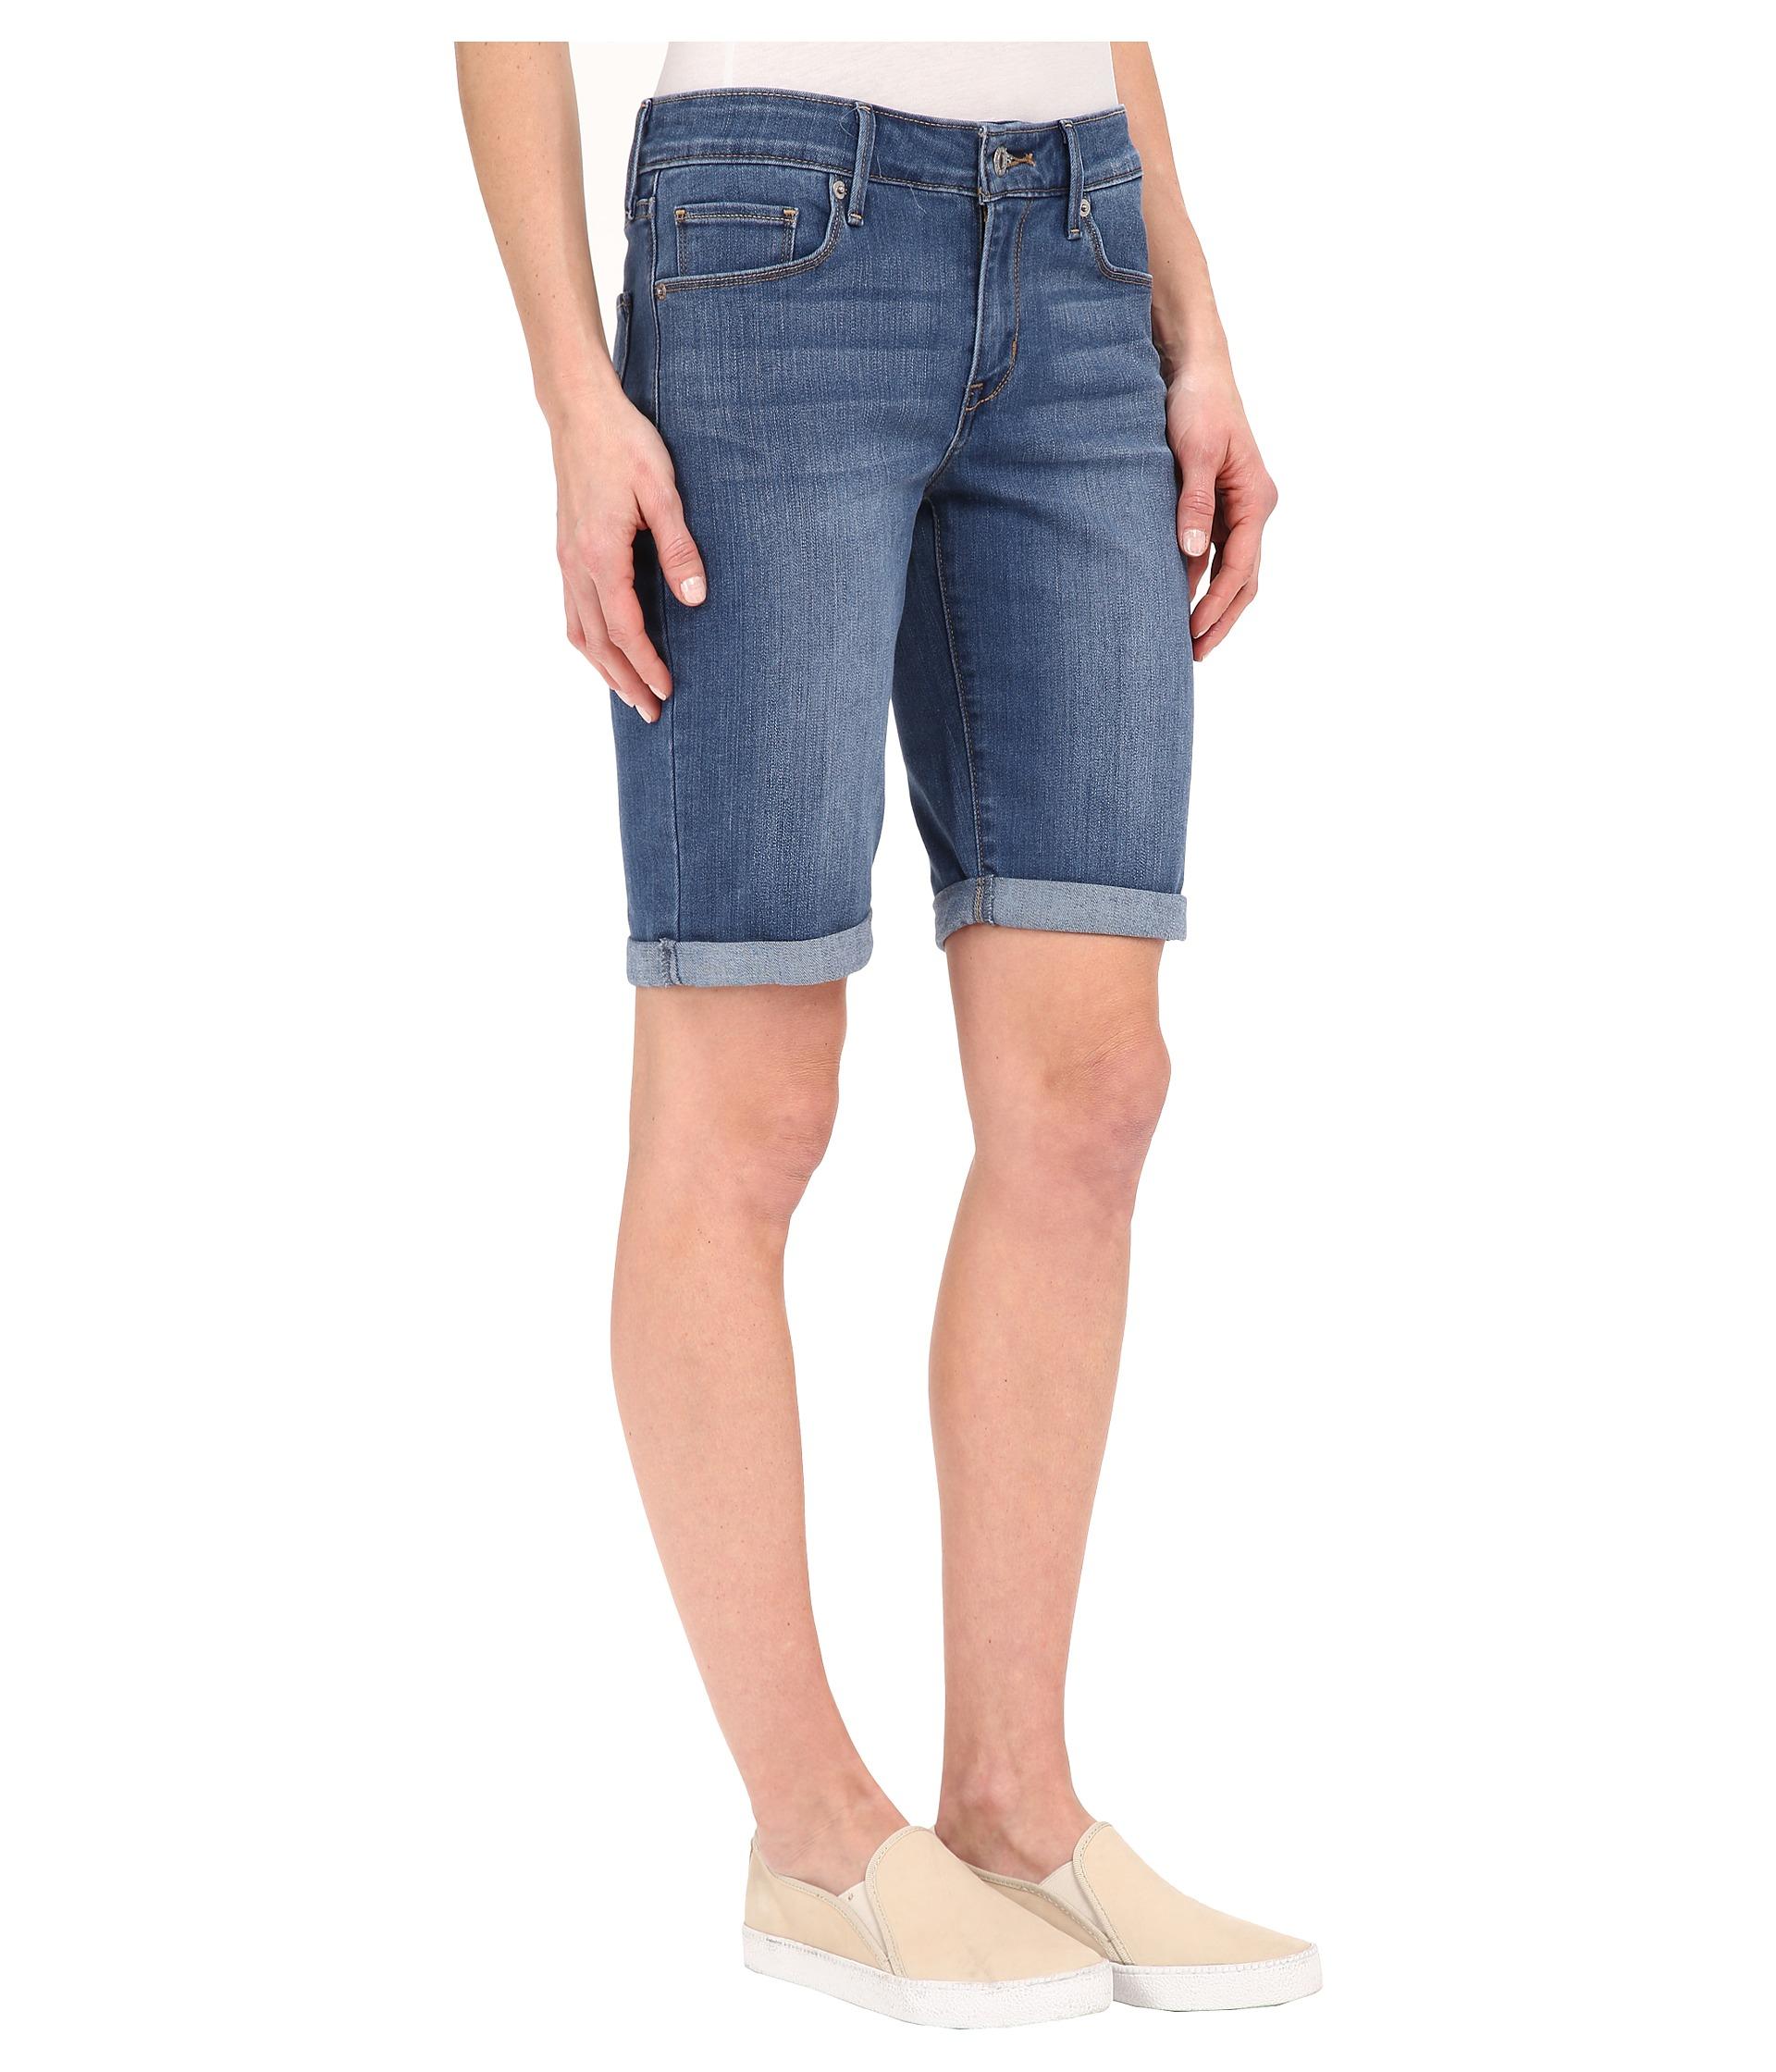 Levi's® Womens Bermuda Shorts Western Hue - Zappos.com Free Shipping BOTH Ways